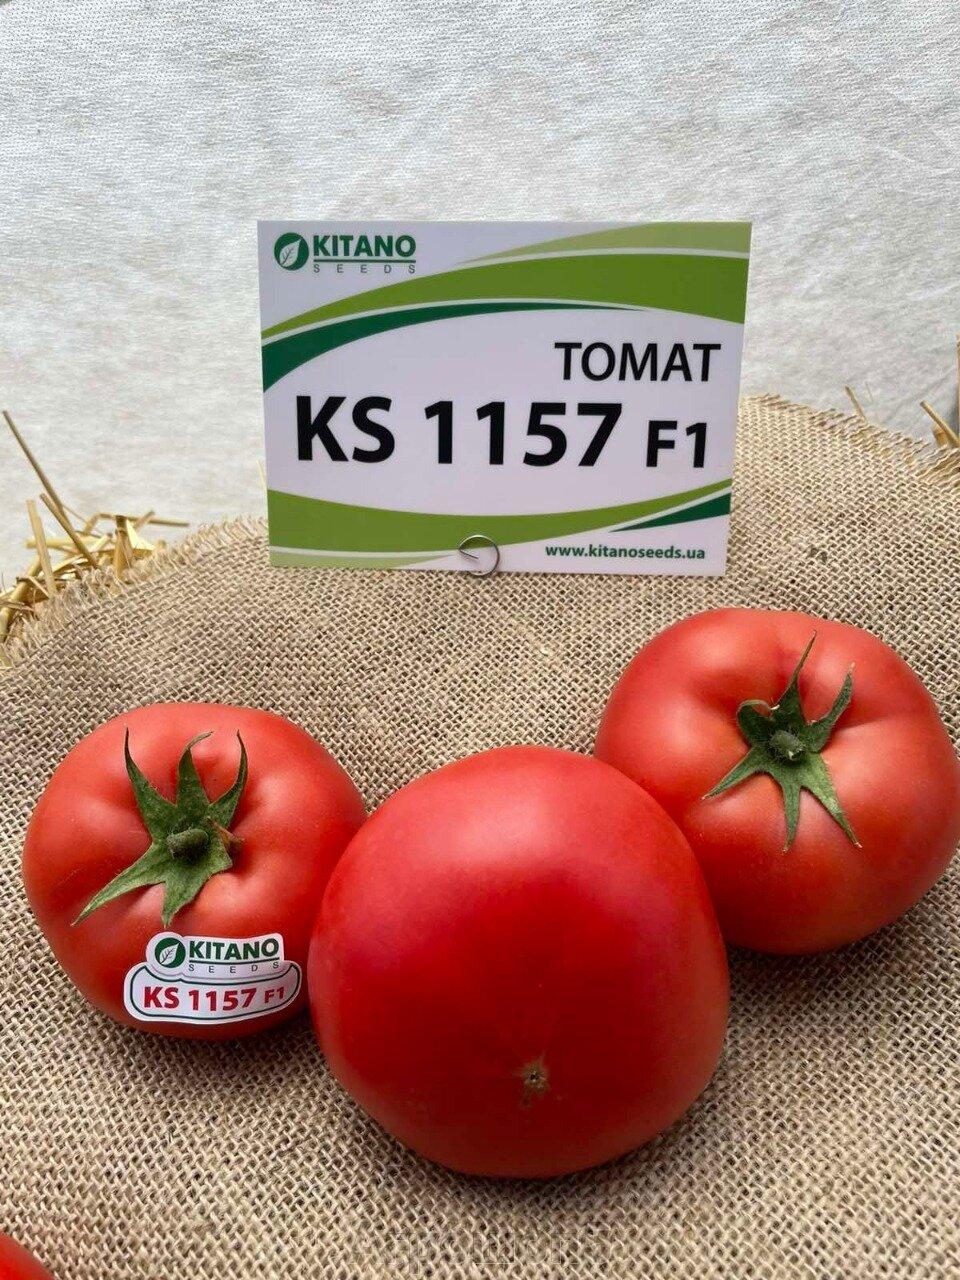 День поля по томатам от компании Kitano - фото pic_325864eb8c93e16c788c85d53a103e95_1920x9000_1.jpg